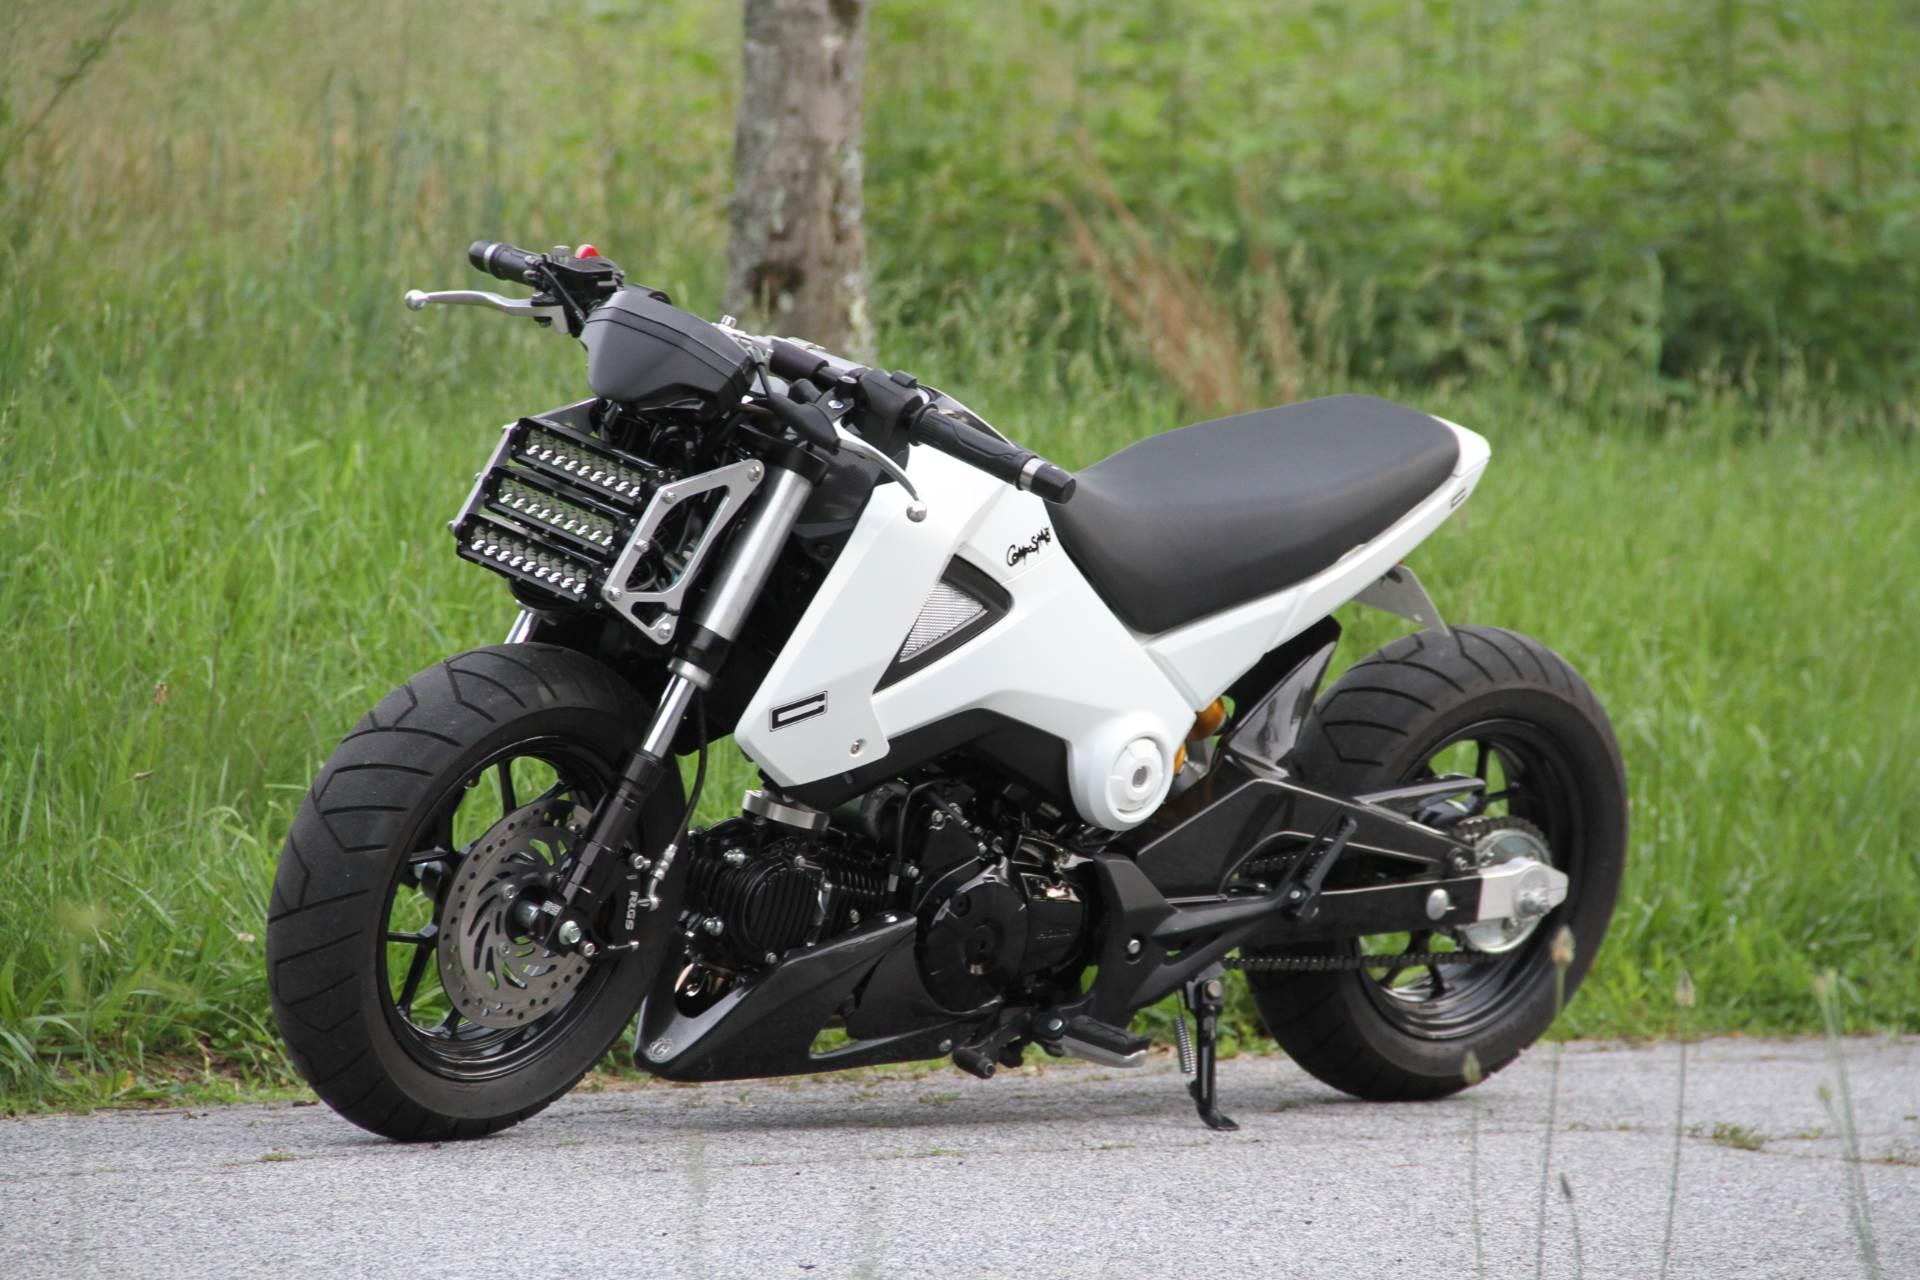 New 2015 Honda Grom Motorcycles in Hendersonville NC